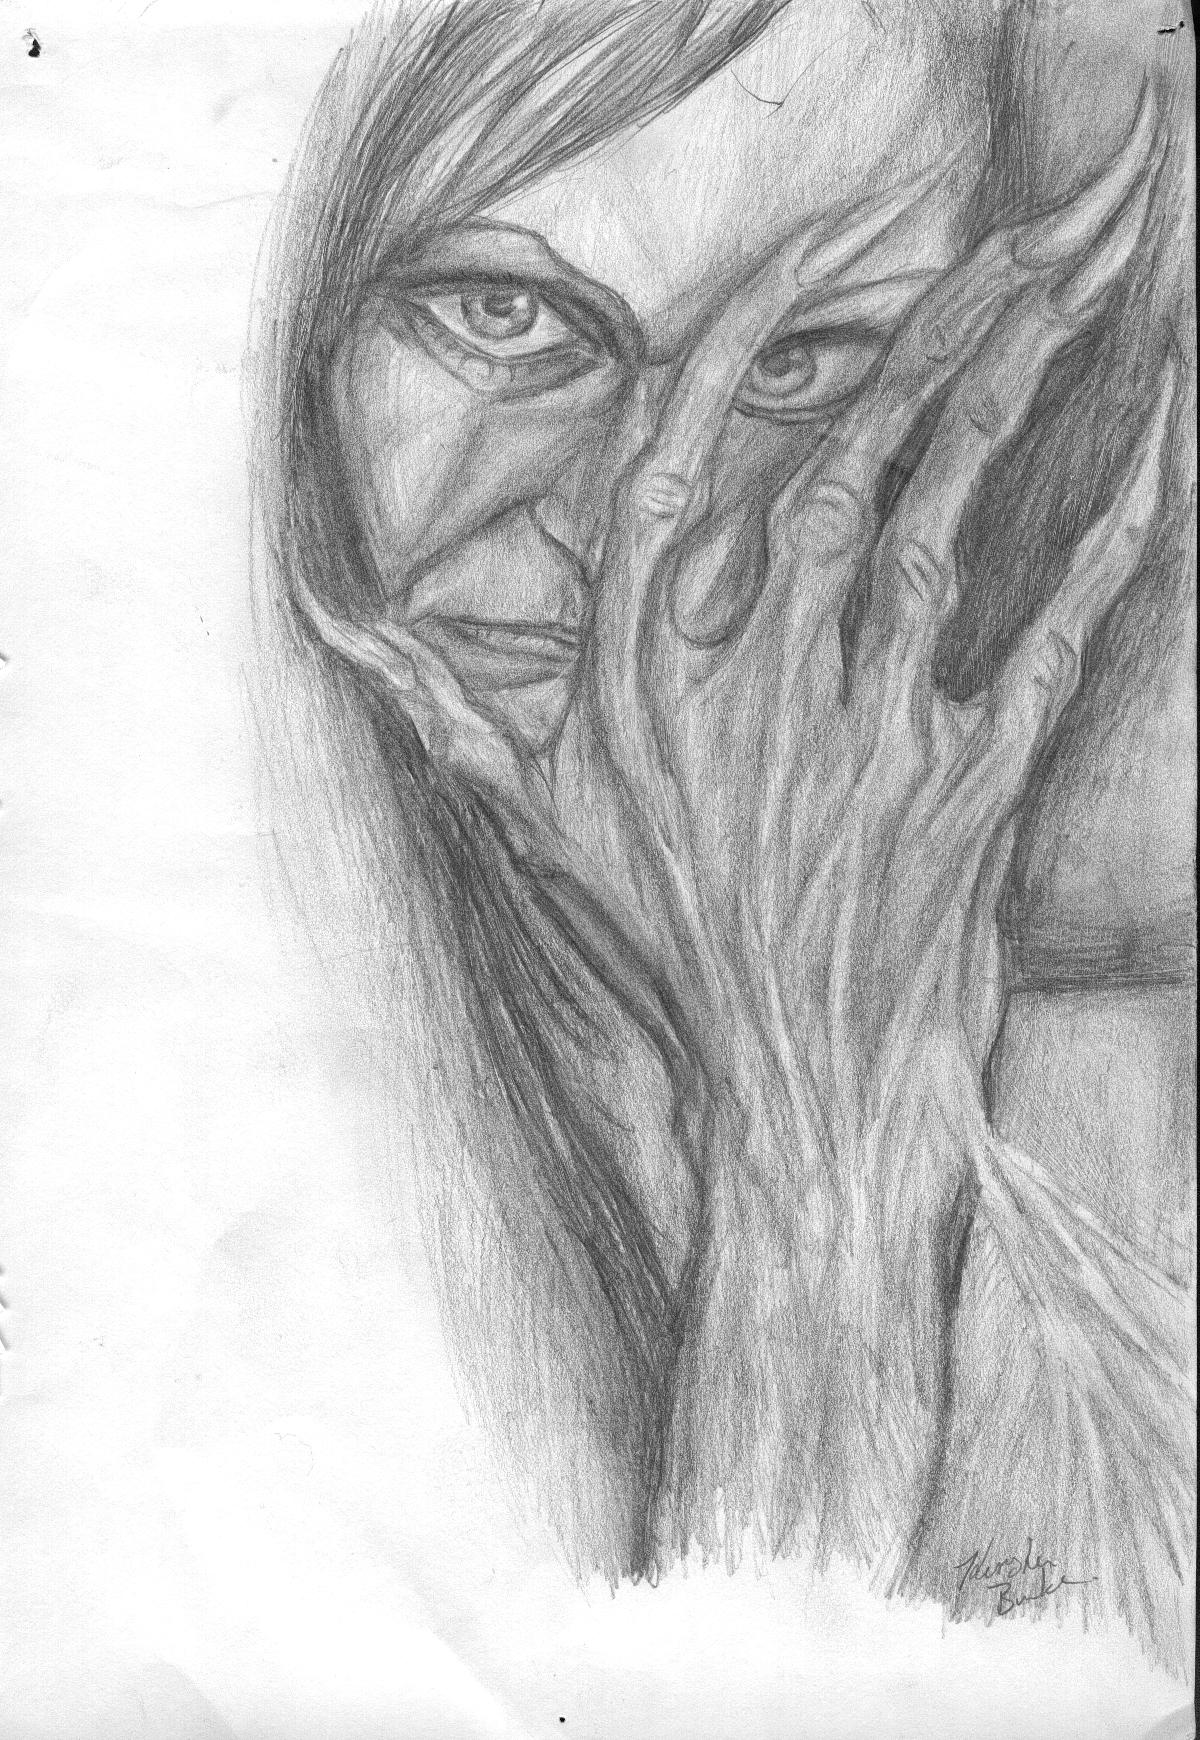 Evil Fairy Queen by Skunko22 on DeviantArt